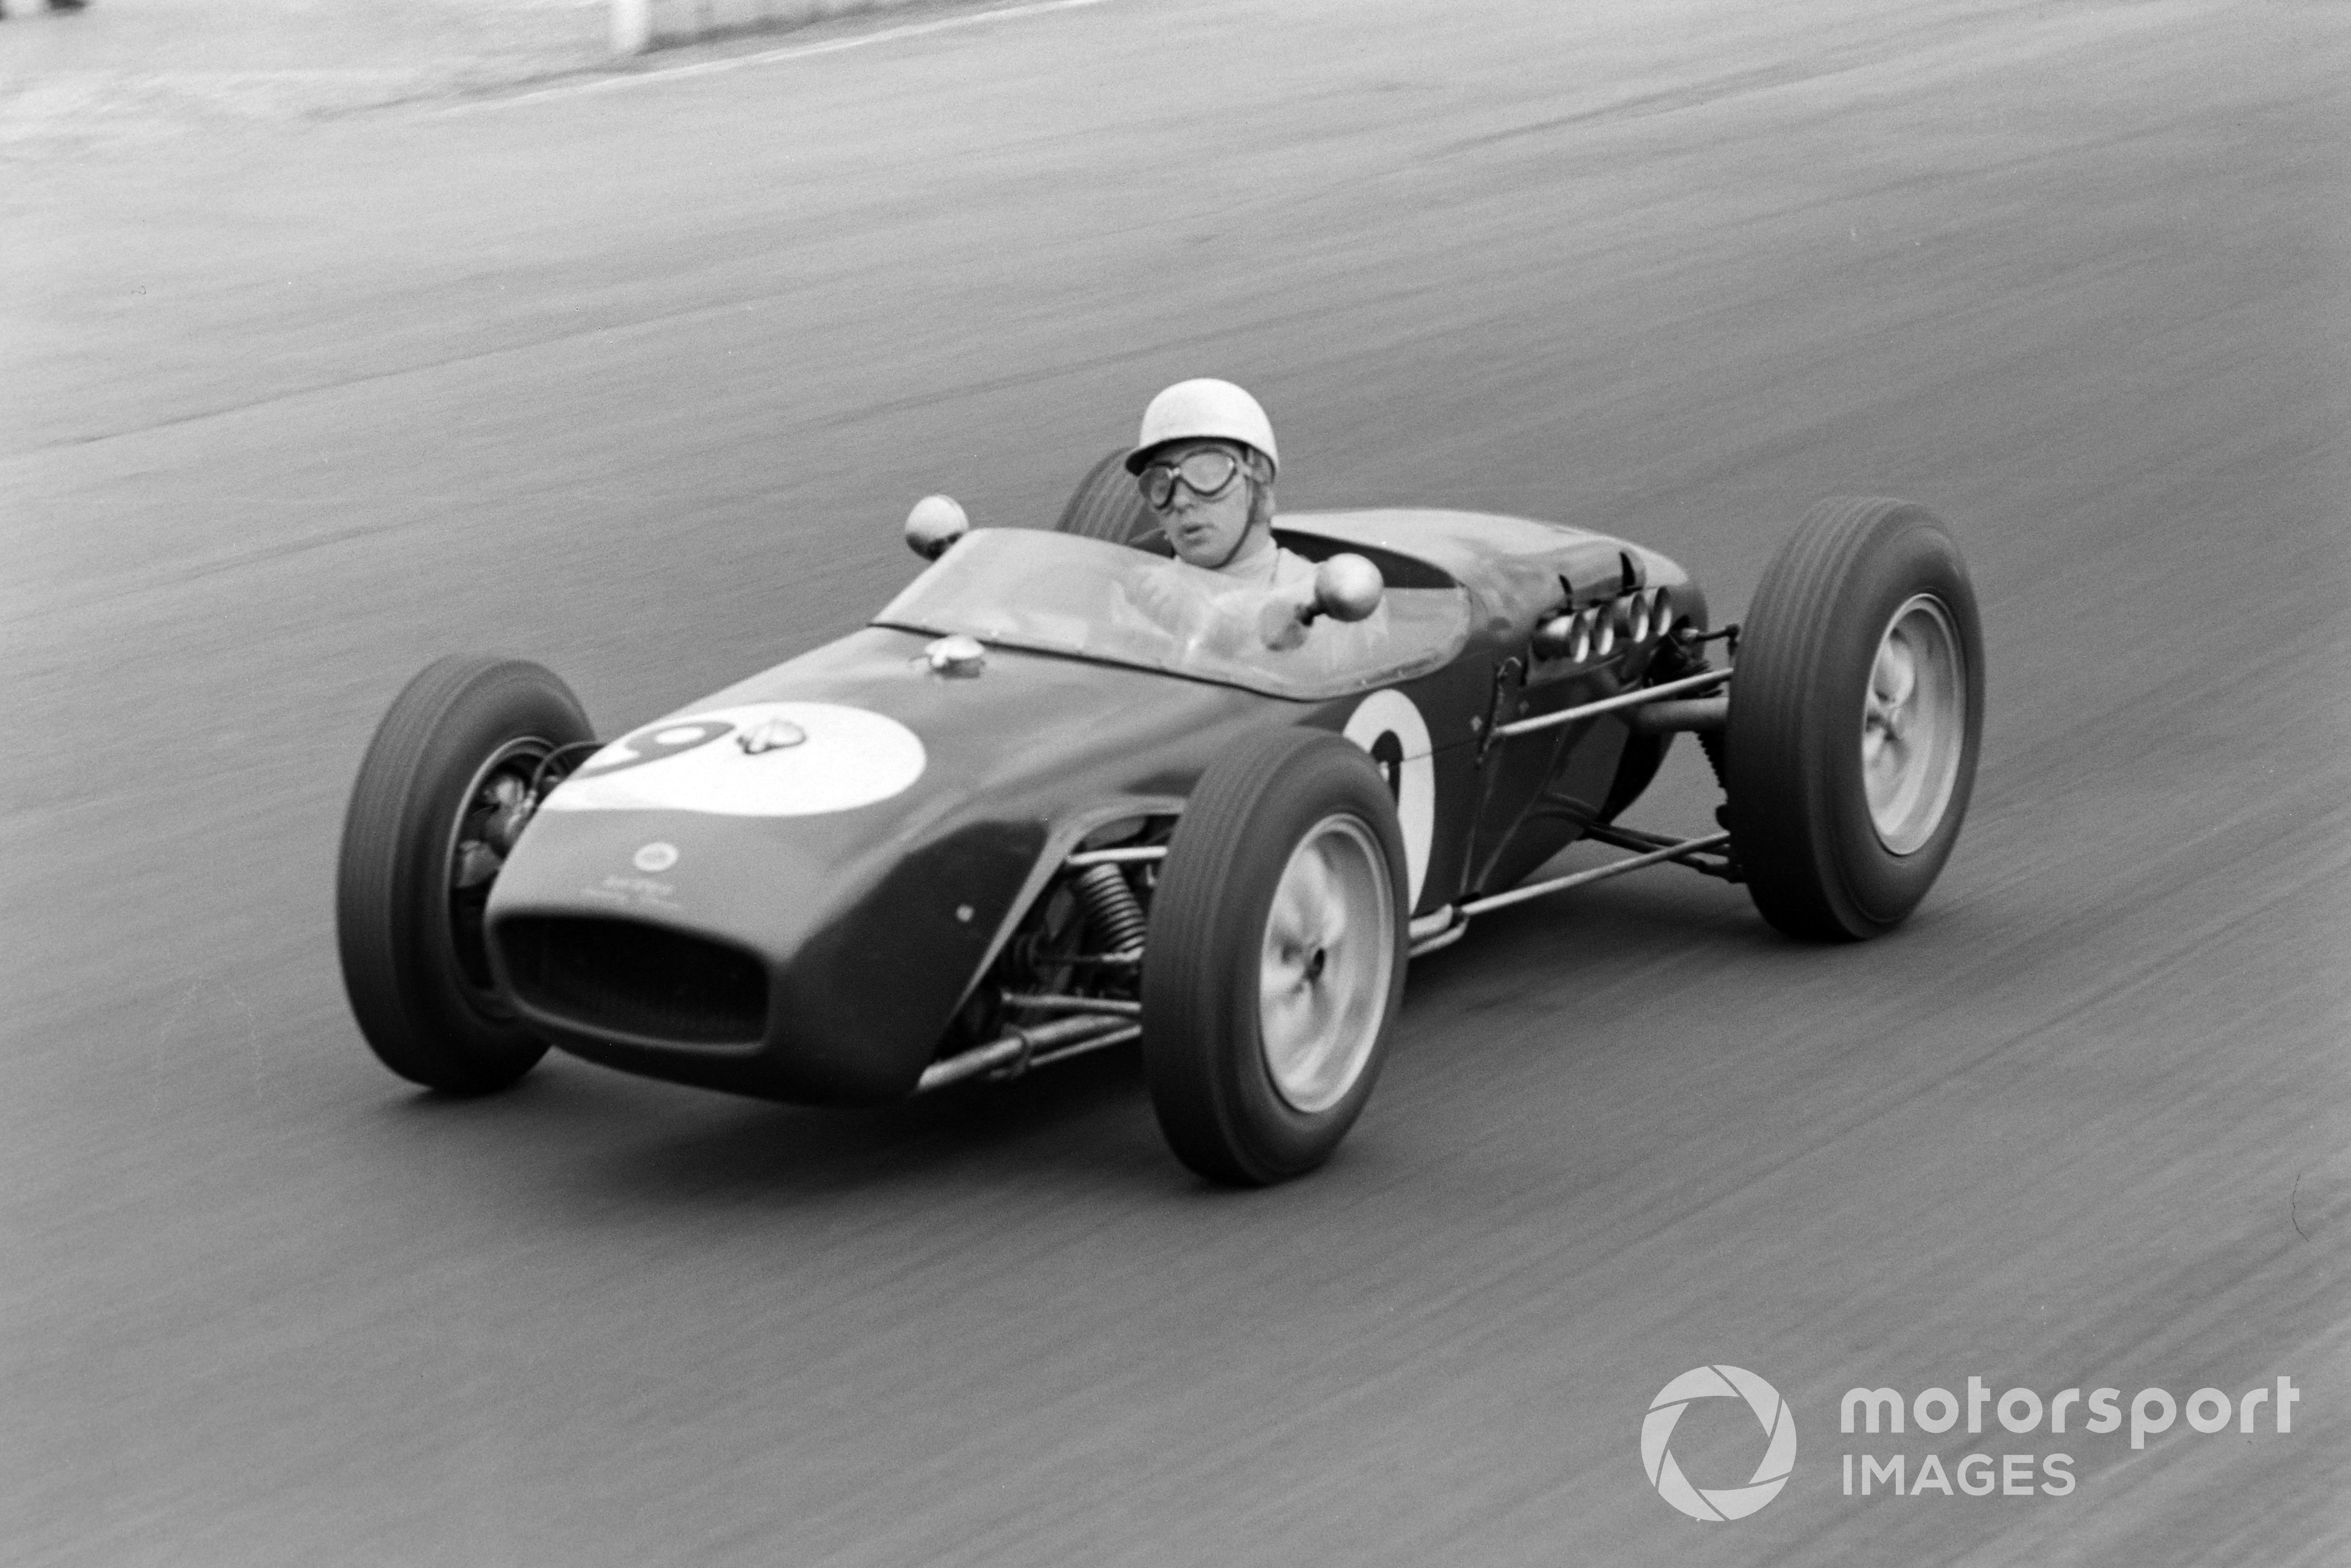 John Surtees in the Lotus-Climax 18 at the 1960 British GP